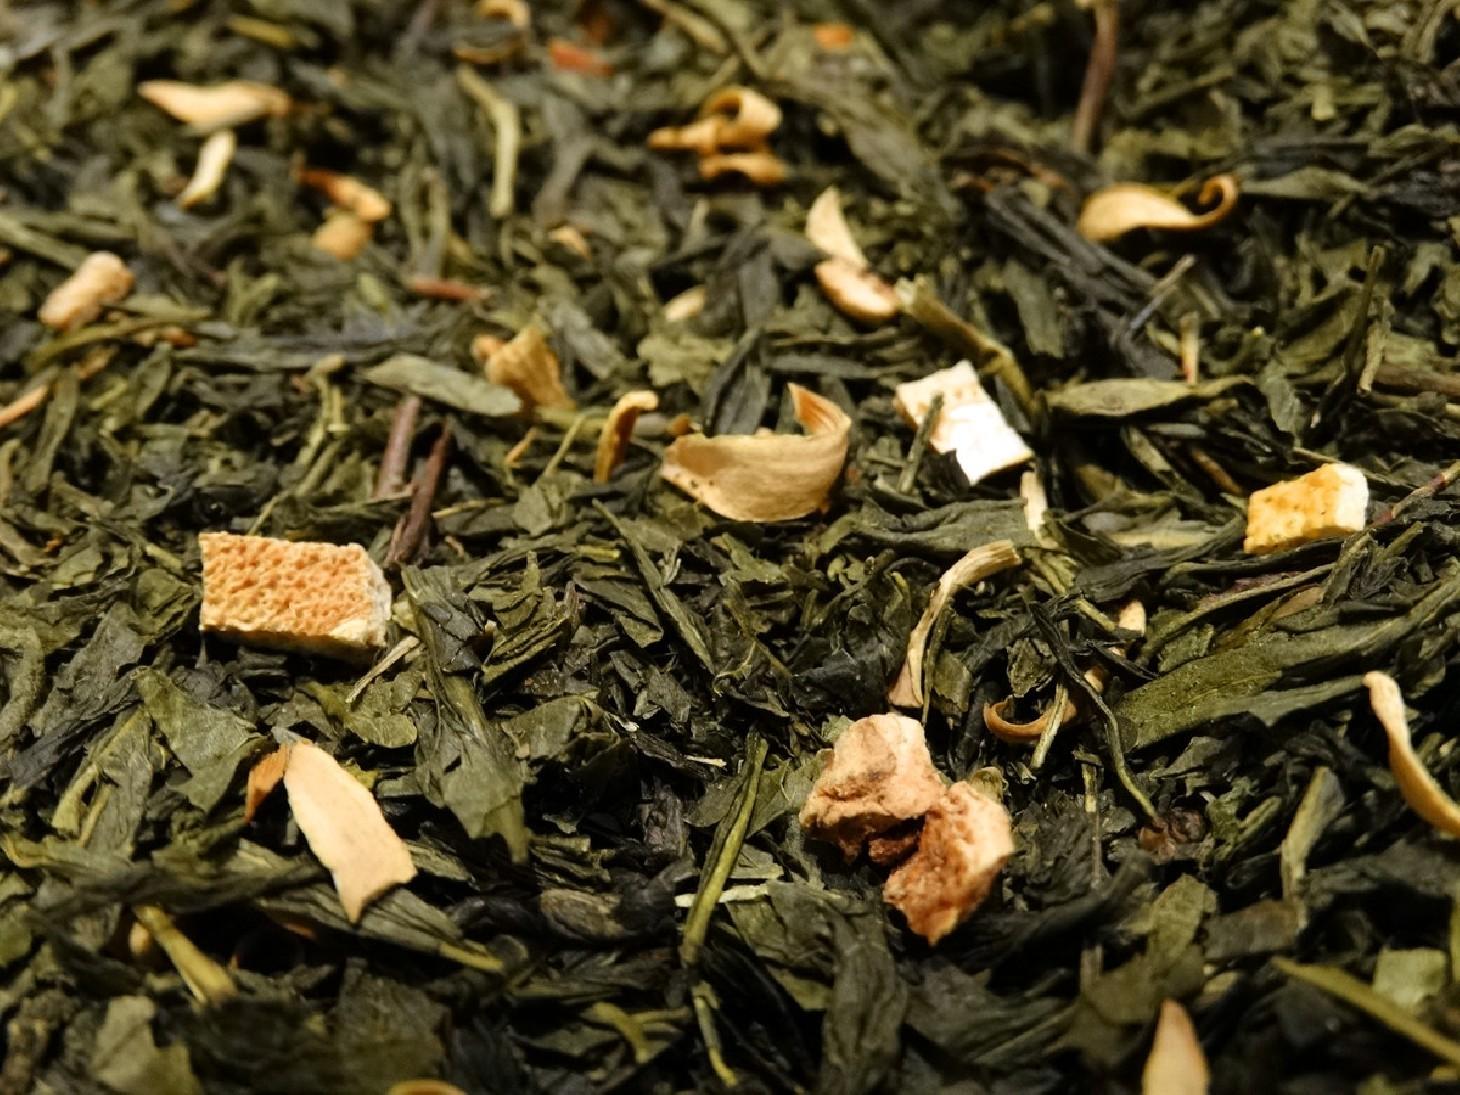 thé vert green earl grey parfumé bergamote comptoir de thé en ligne Tea & Cie www.teacie.com